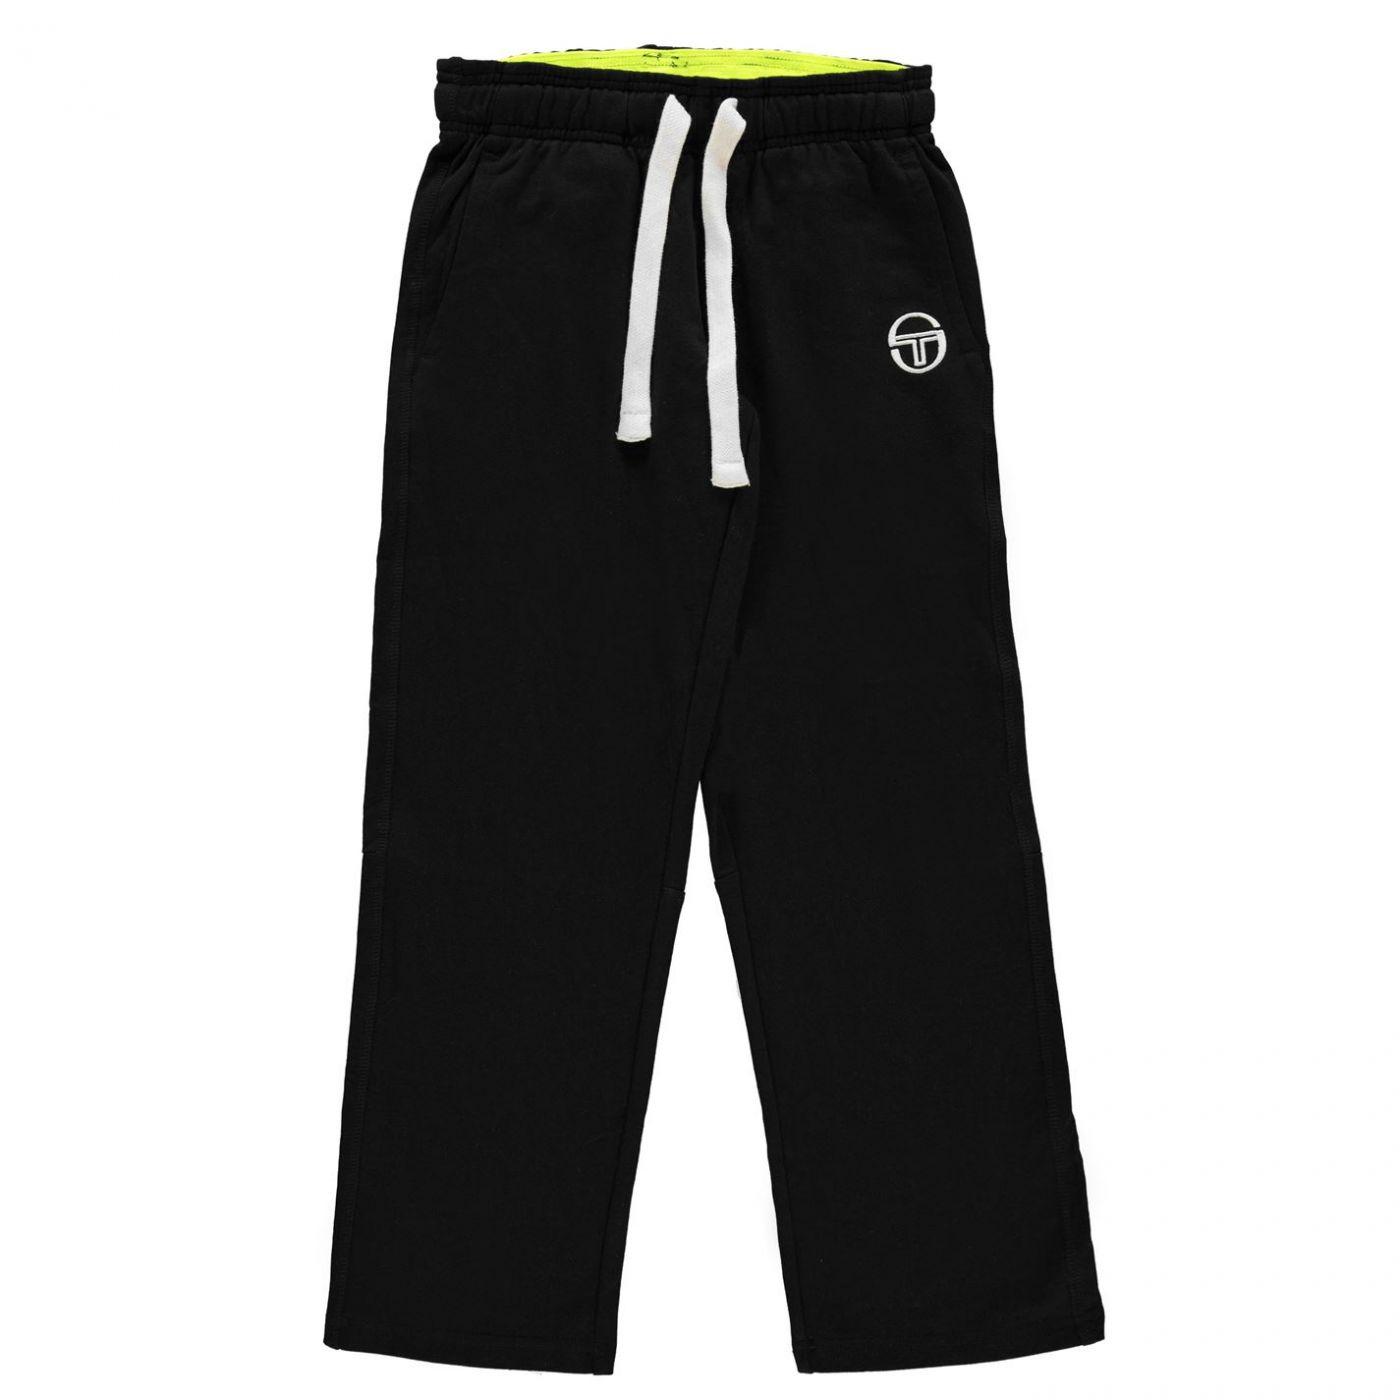 Sergio Tacchini Elbow Track Pants Junior Boys